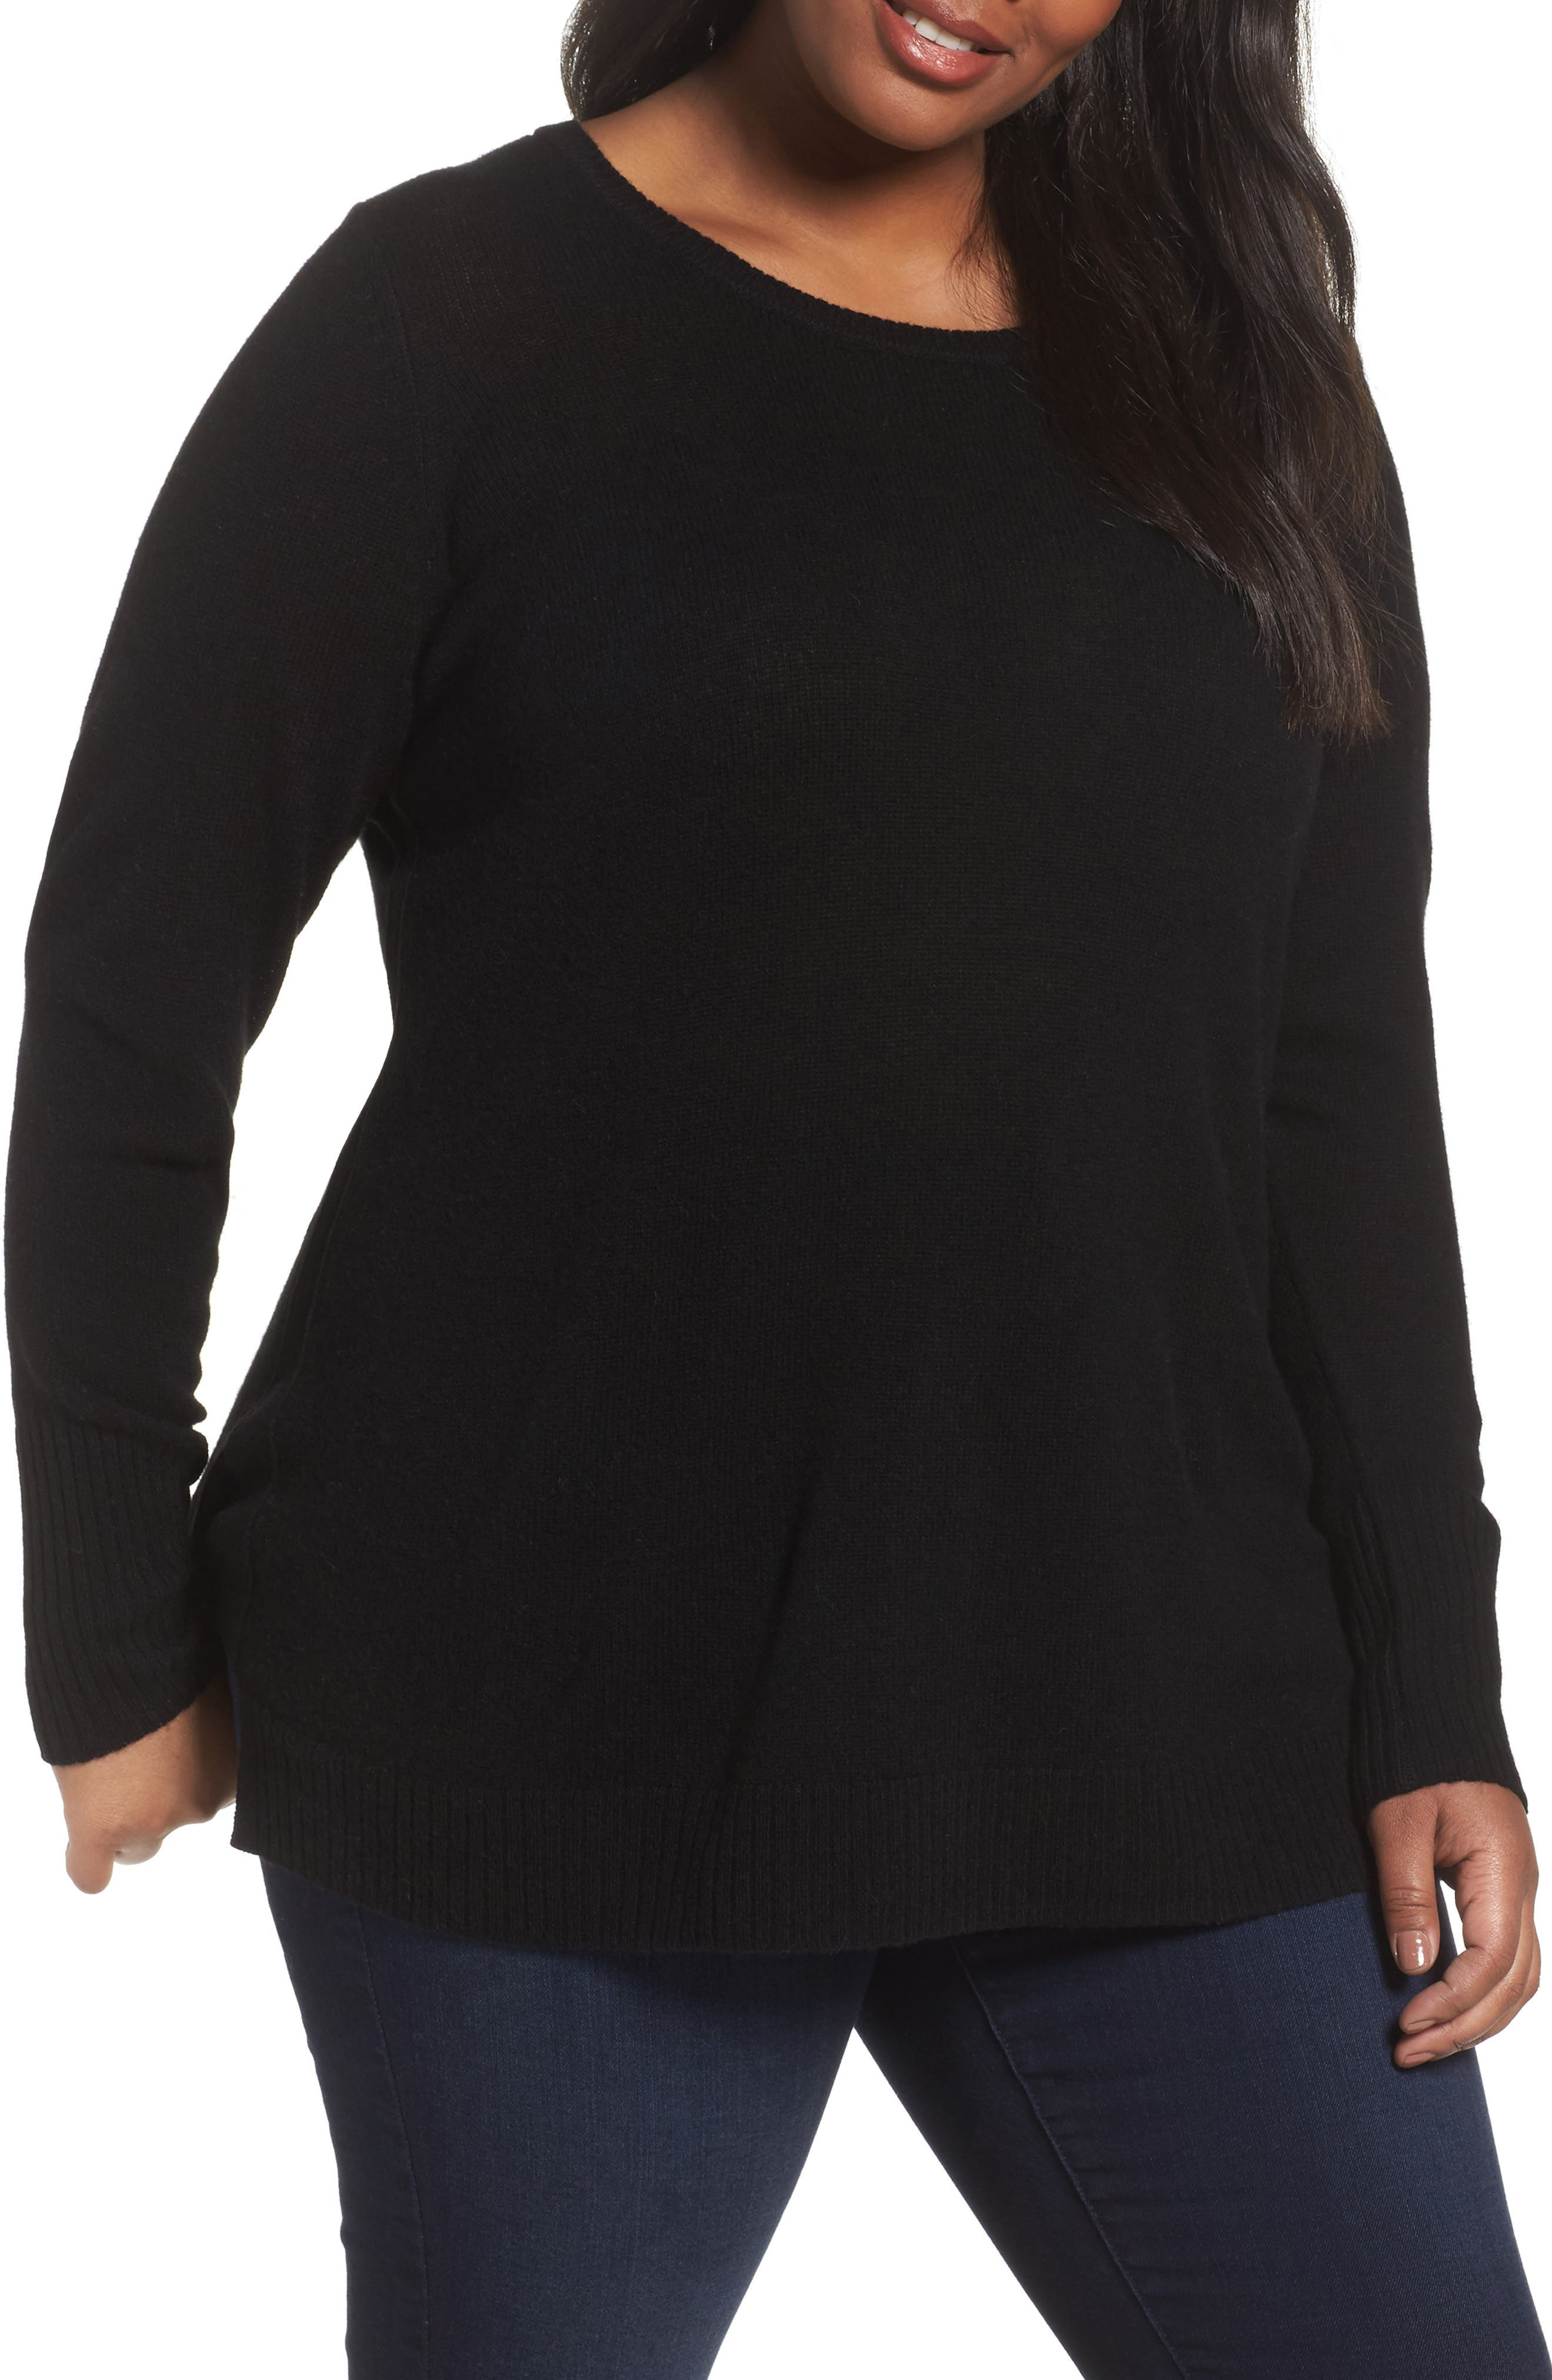 Alternate Image 1 Selected - Sejour Crewneck Side Split Wool & Cashmere Pullover (Plus Size)